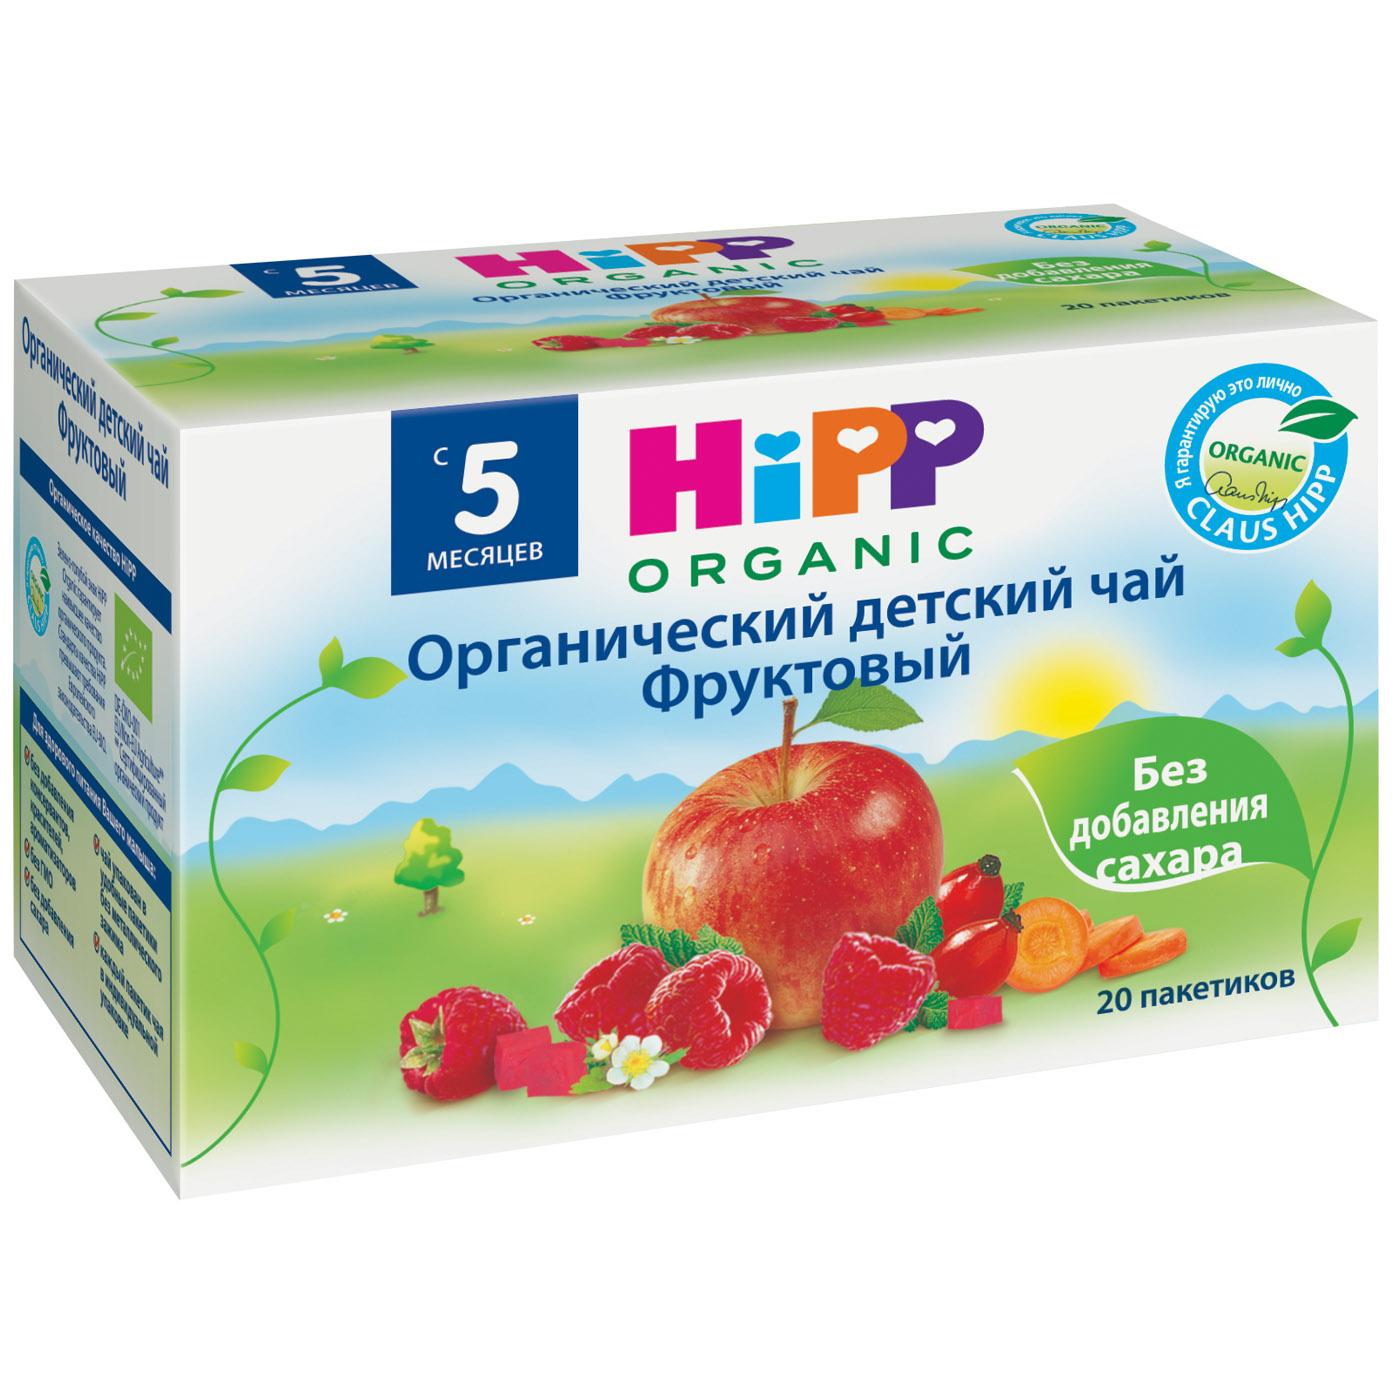 ��� ������� Hipp ������������ 40 �� (20 ���������) ��������� (� 4 ���)